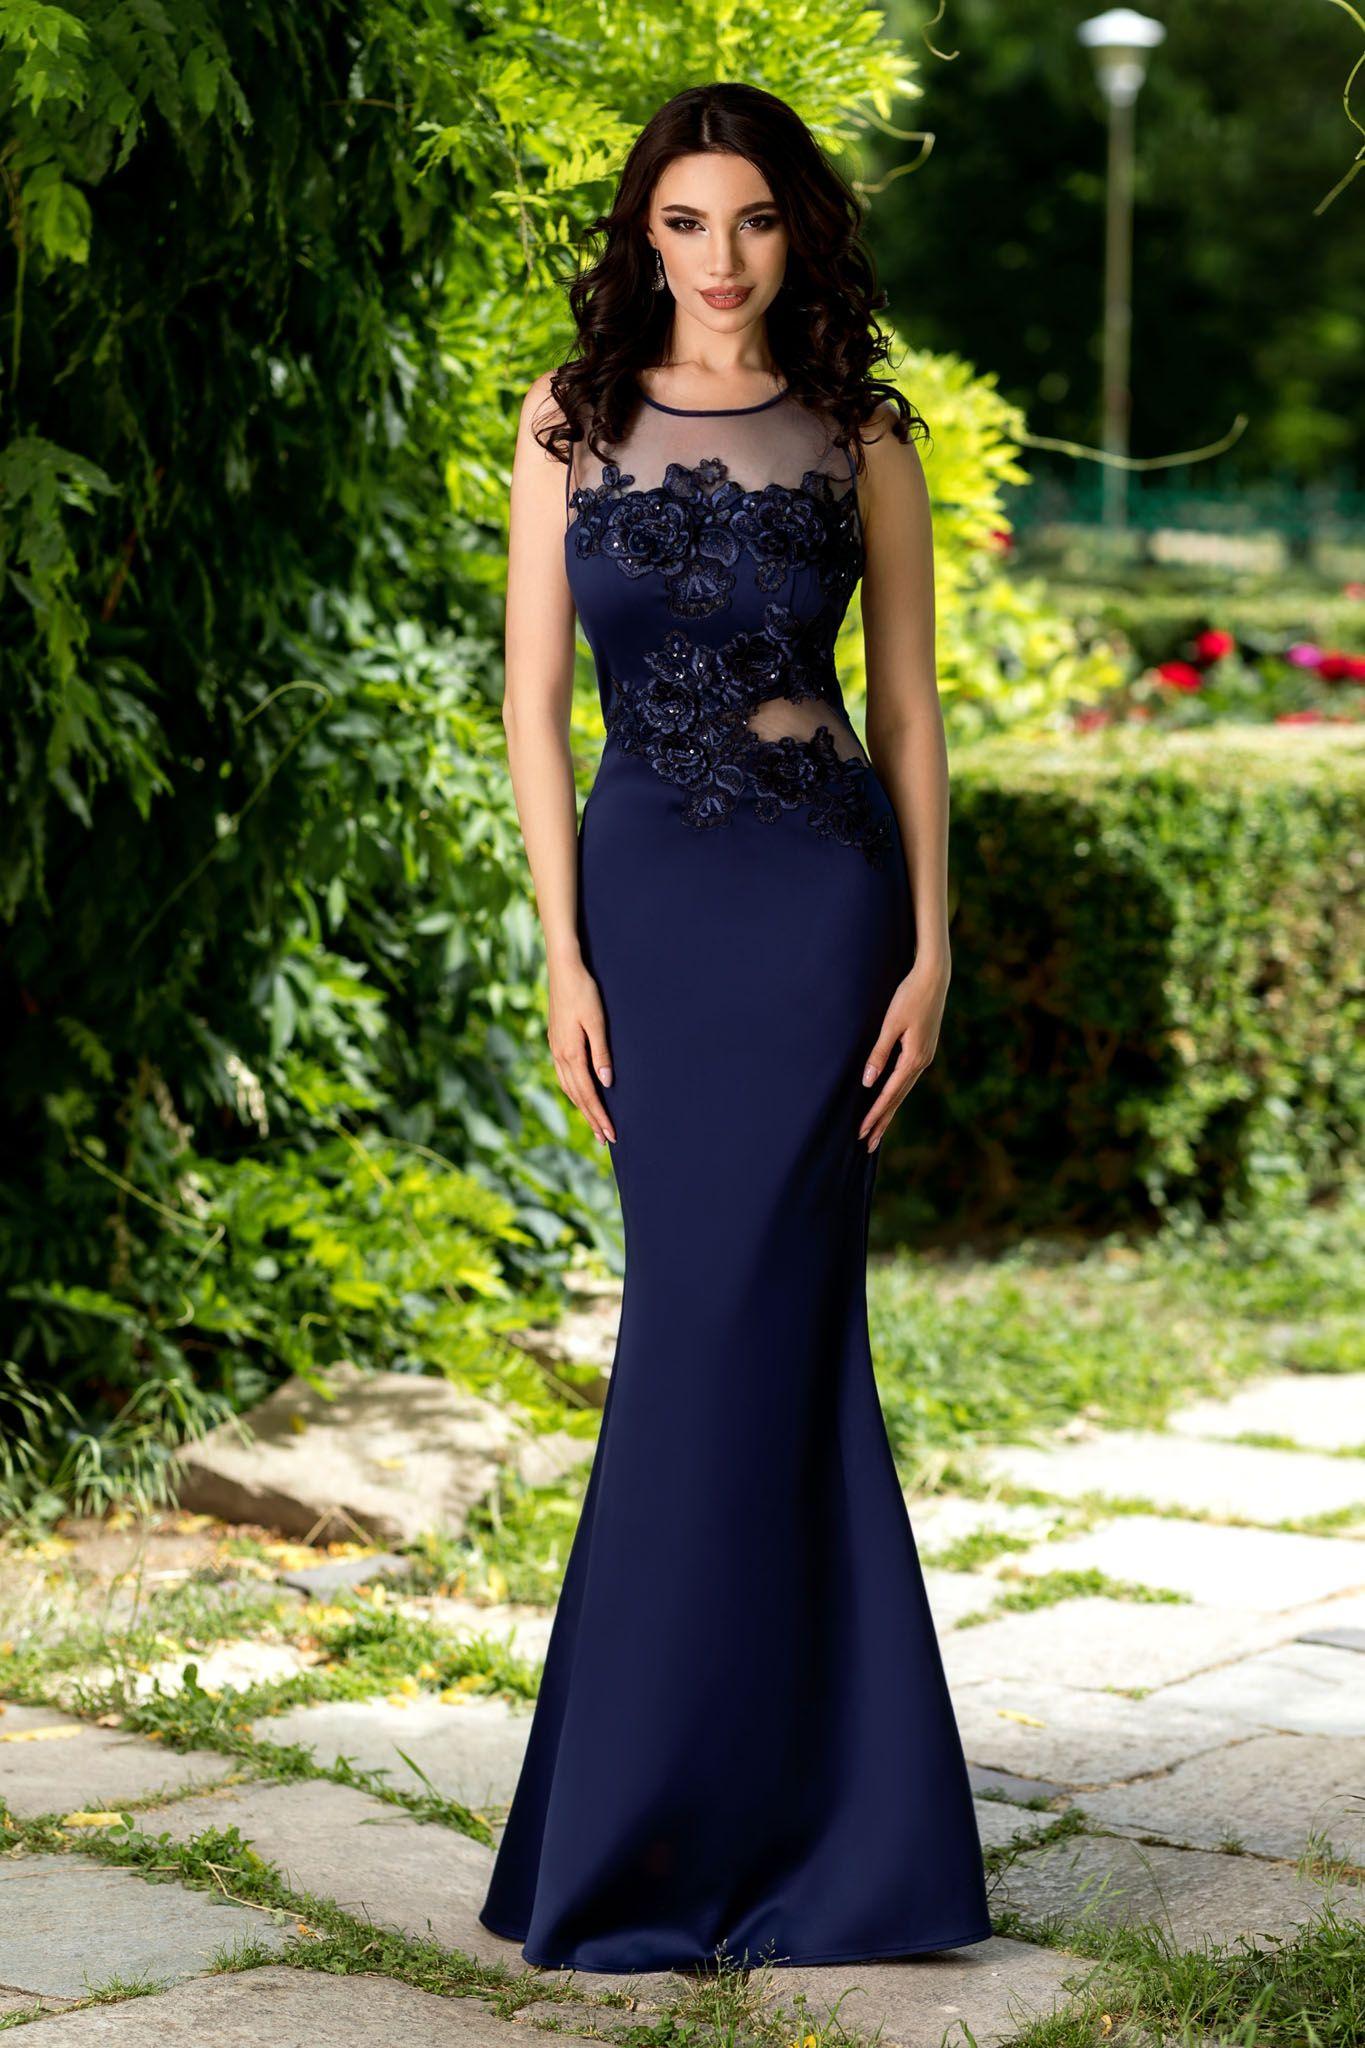 autentic preț scăzut calitate superioară Rochie nasa bleumarin/albastru inchis eleganta lunga pentru ...